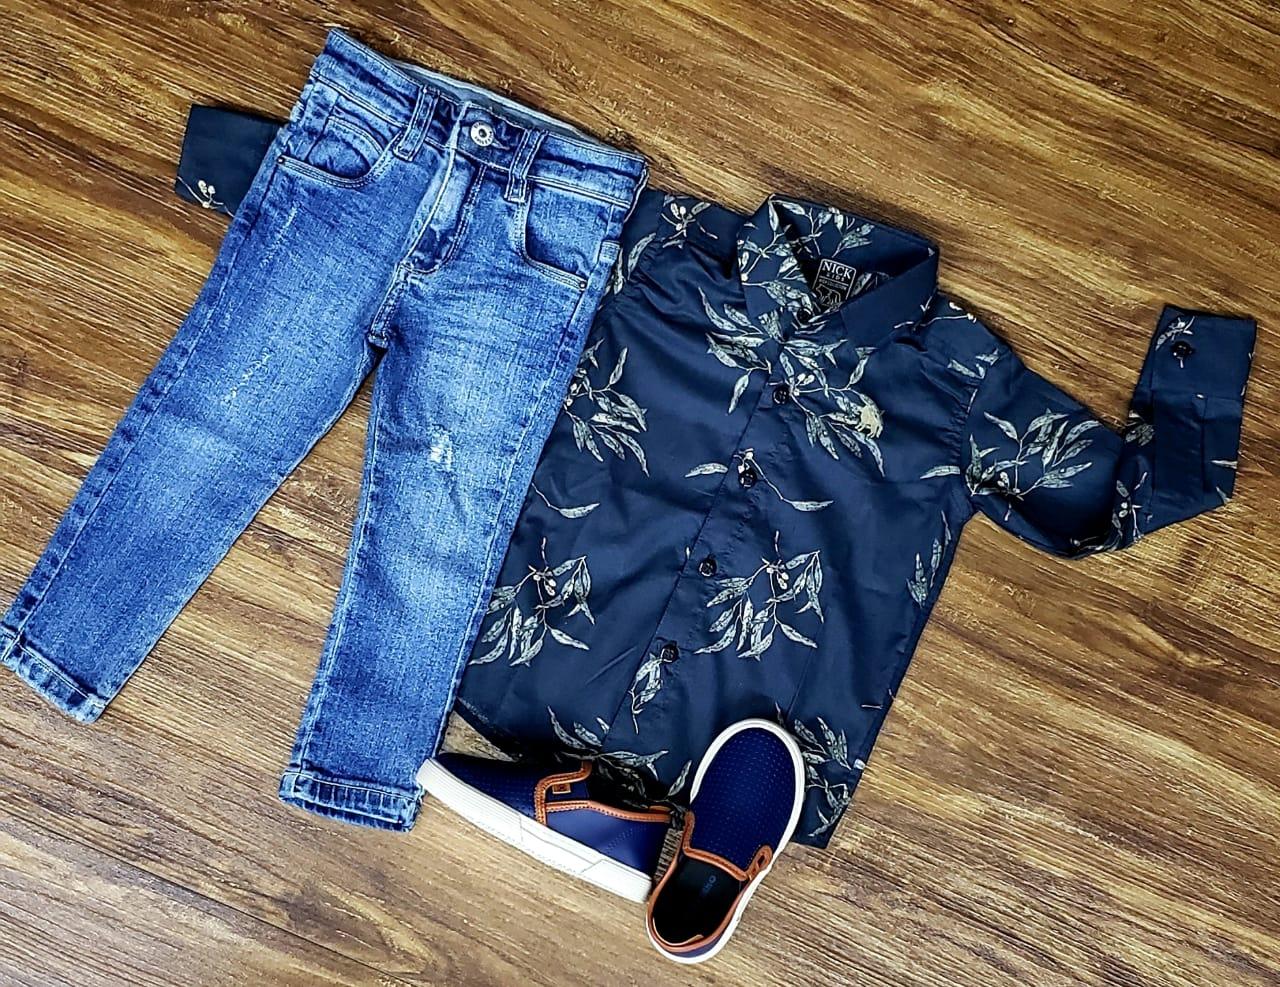 Calça Jeans com Camisa Floral Manga Longa Infantil